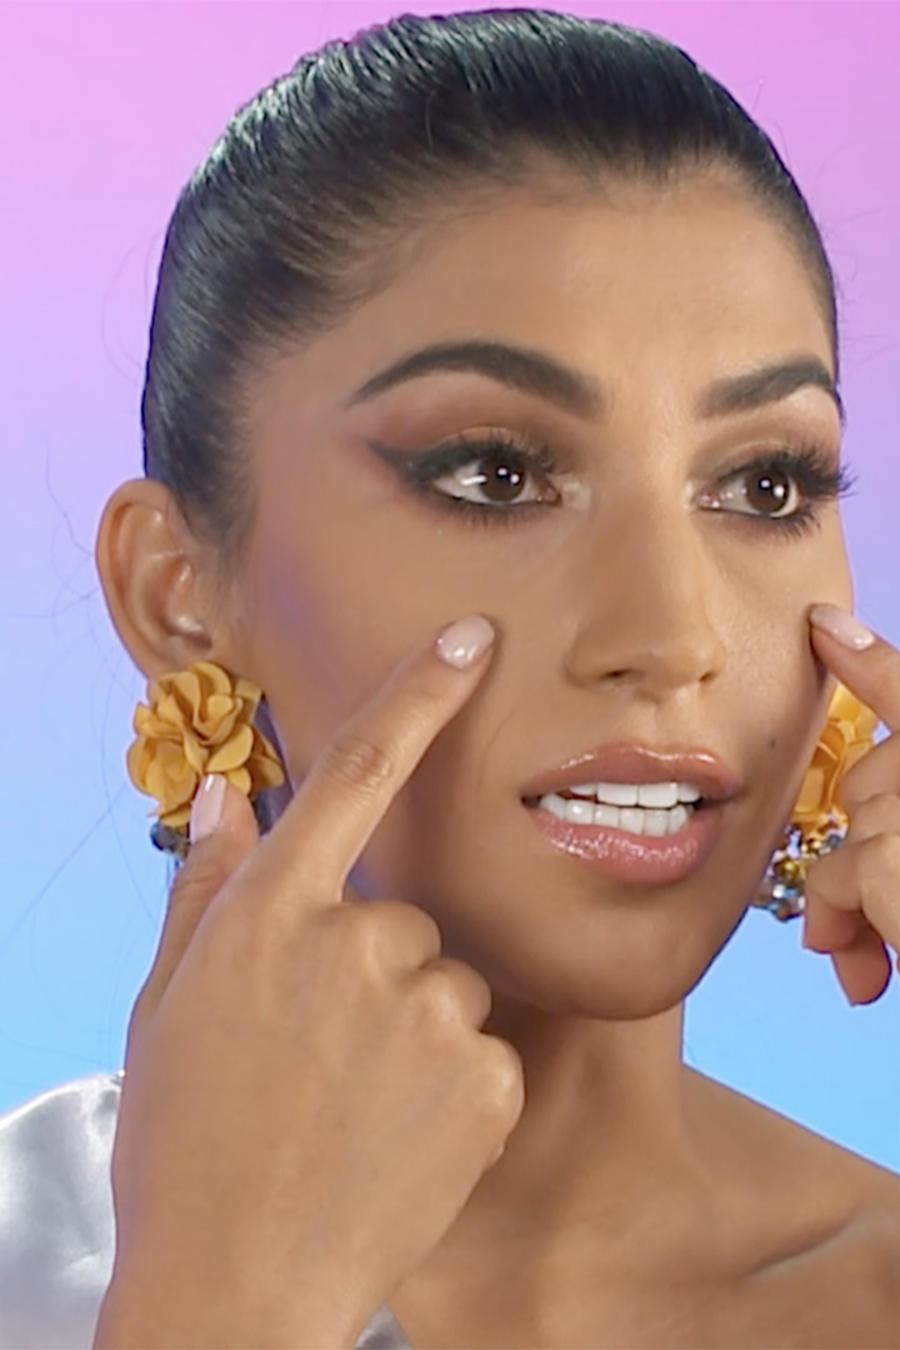 Rosemaryn Arauz, Miss Honduras 2019